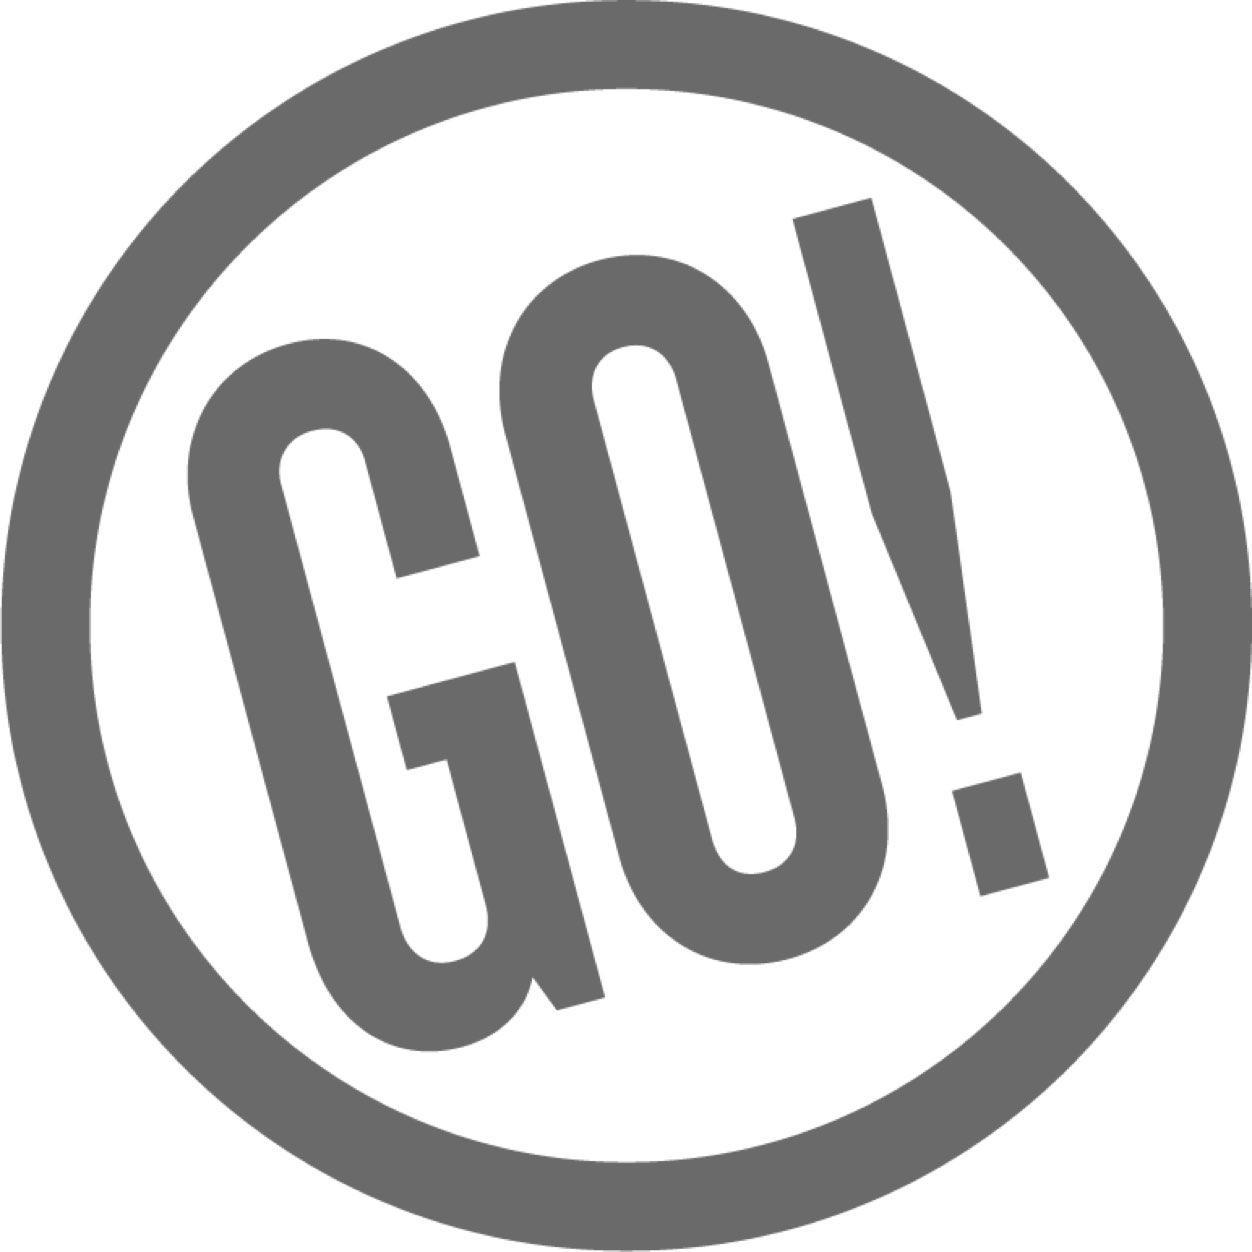 Go Camp Goisgood Twitter